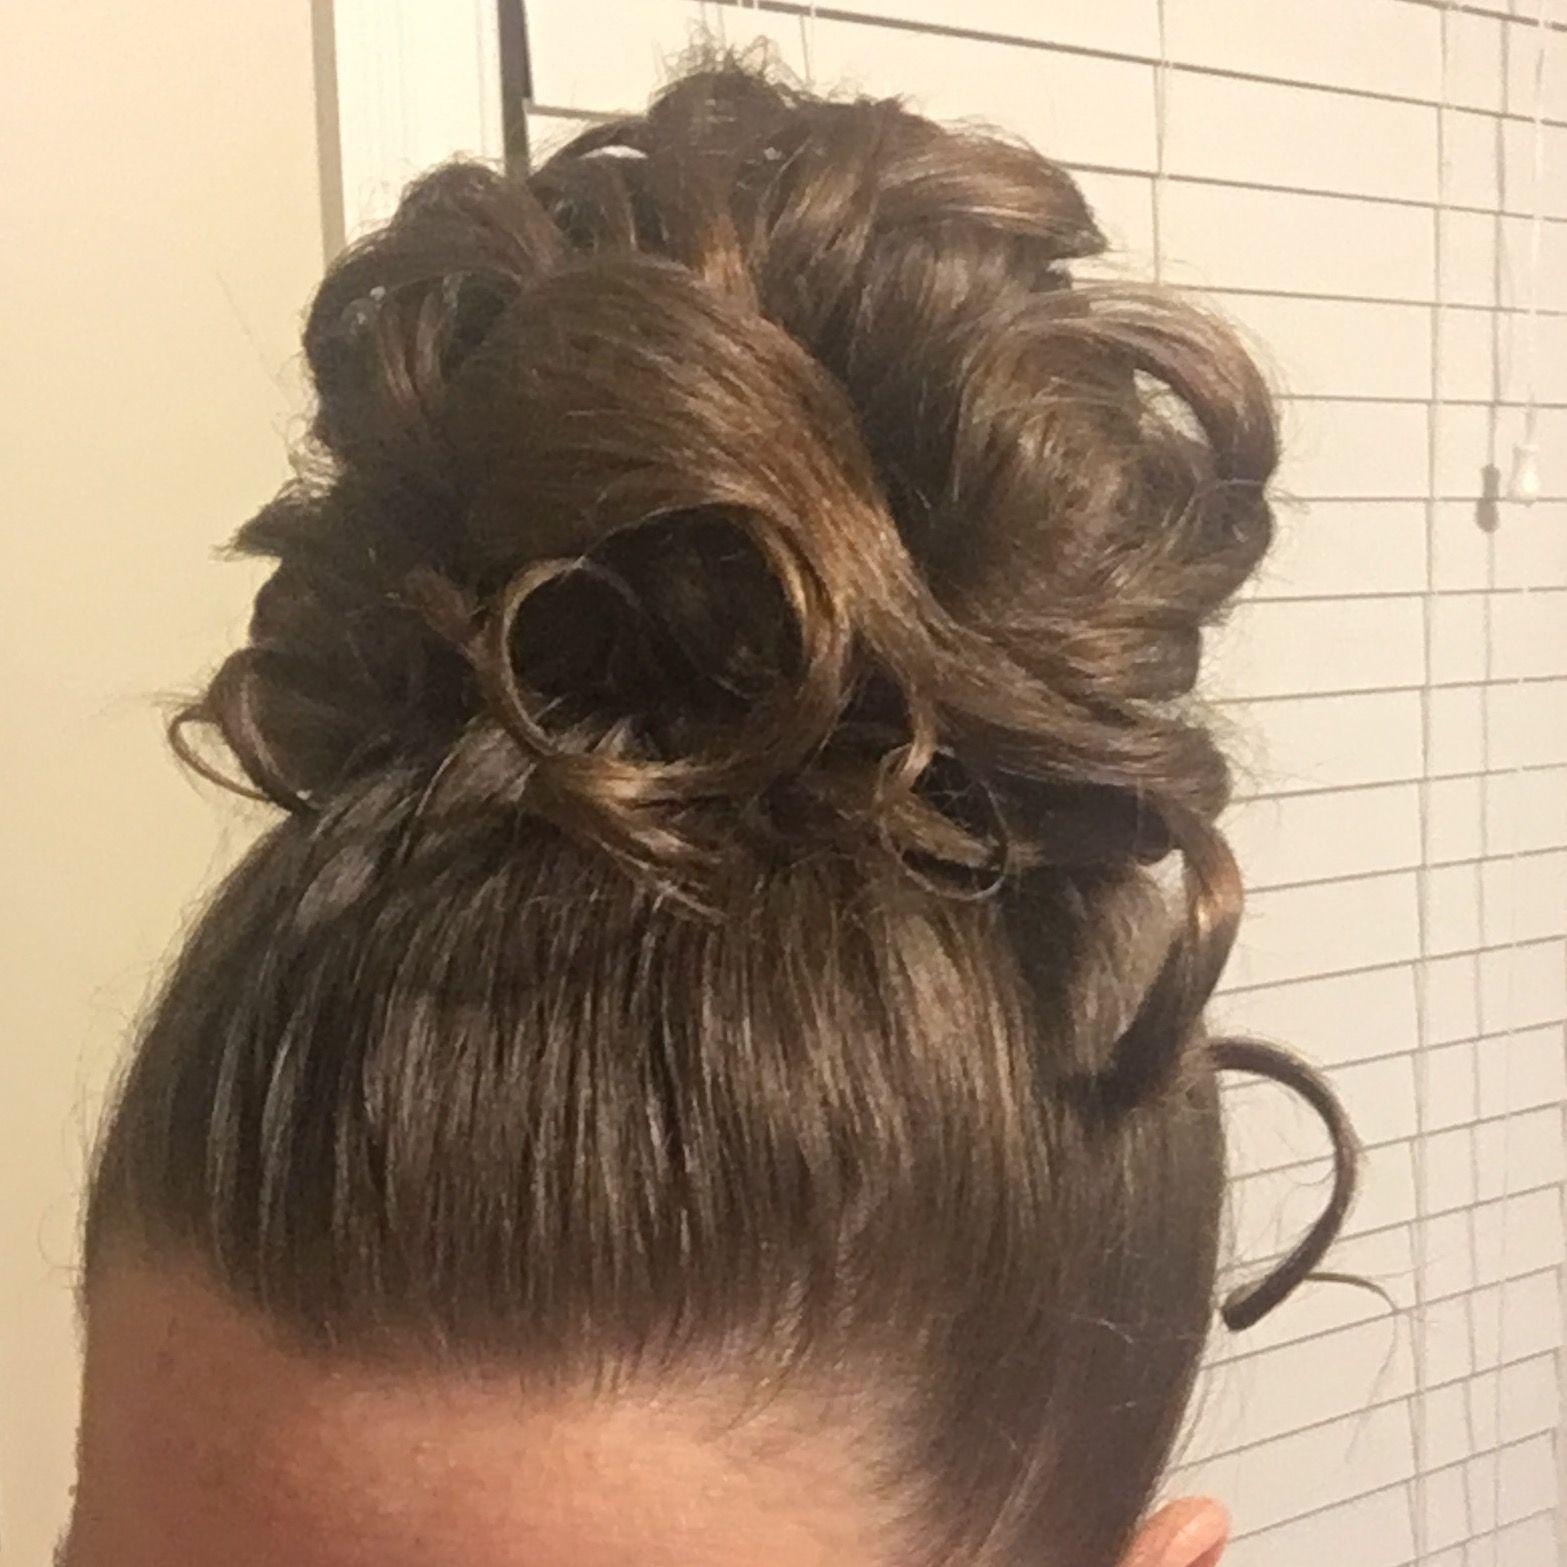 apostolic pentecostal updo hairstyle curled longhair